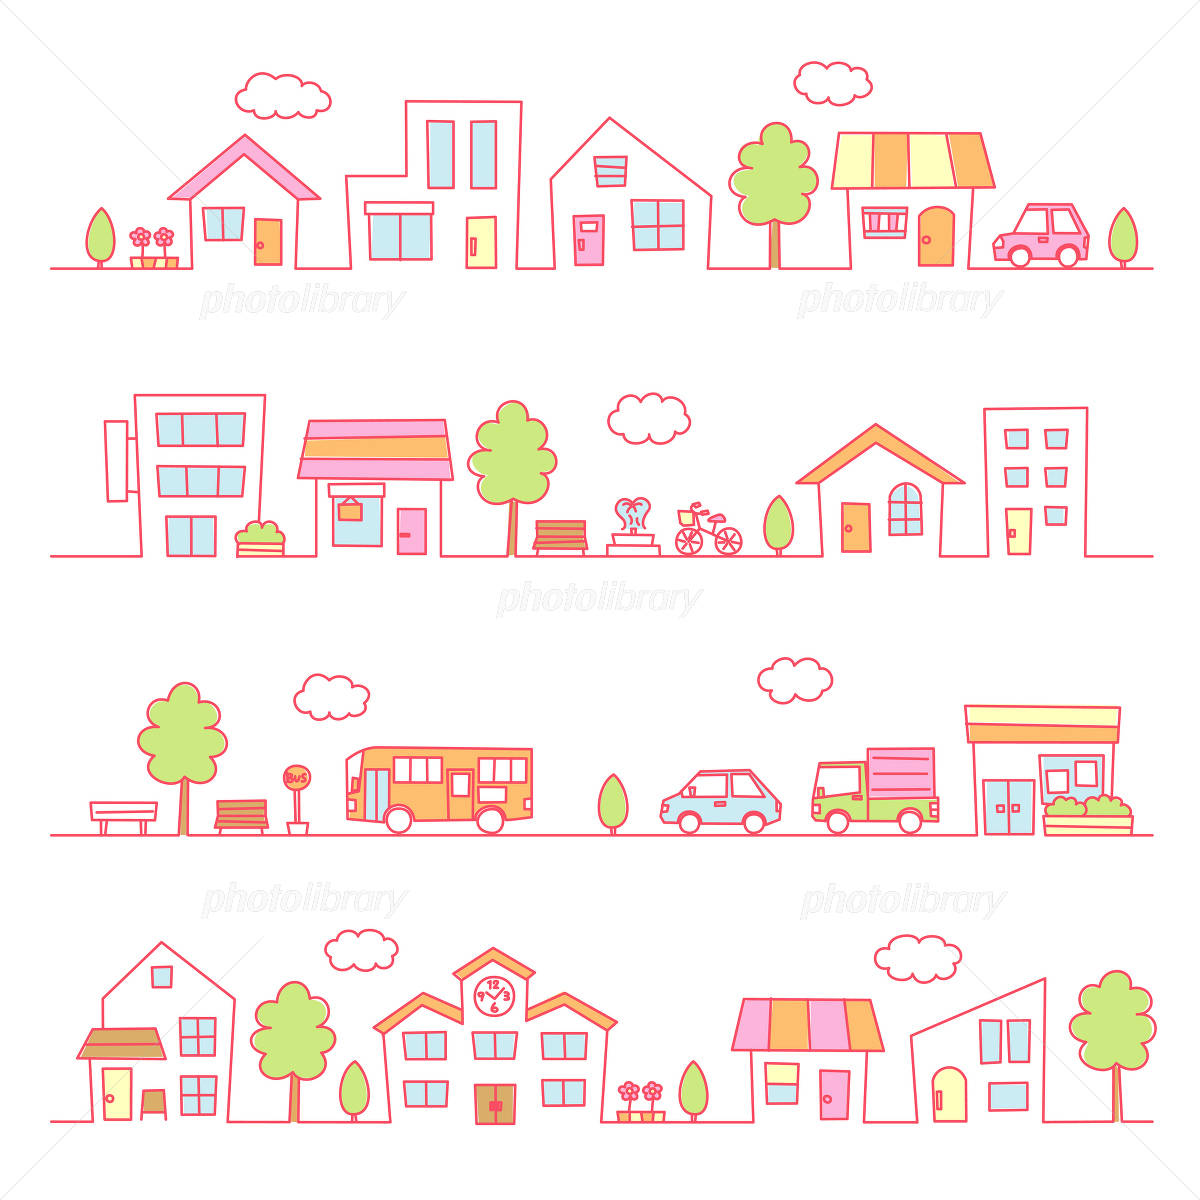 Town pink illustrations イラスト素材